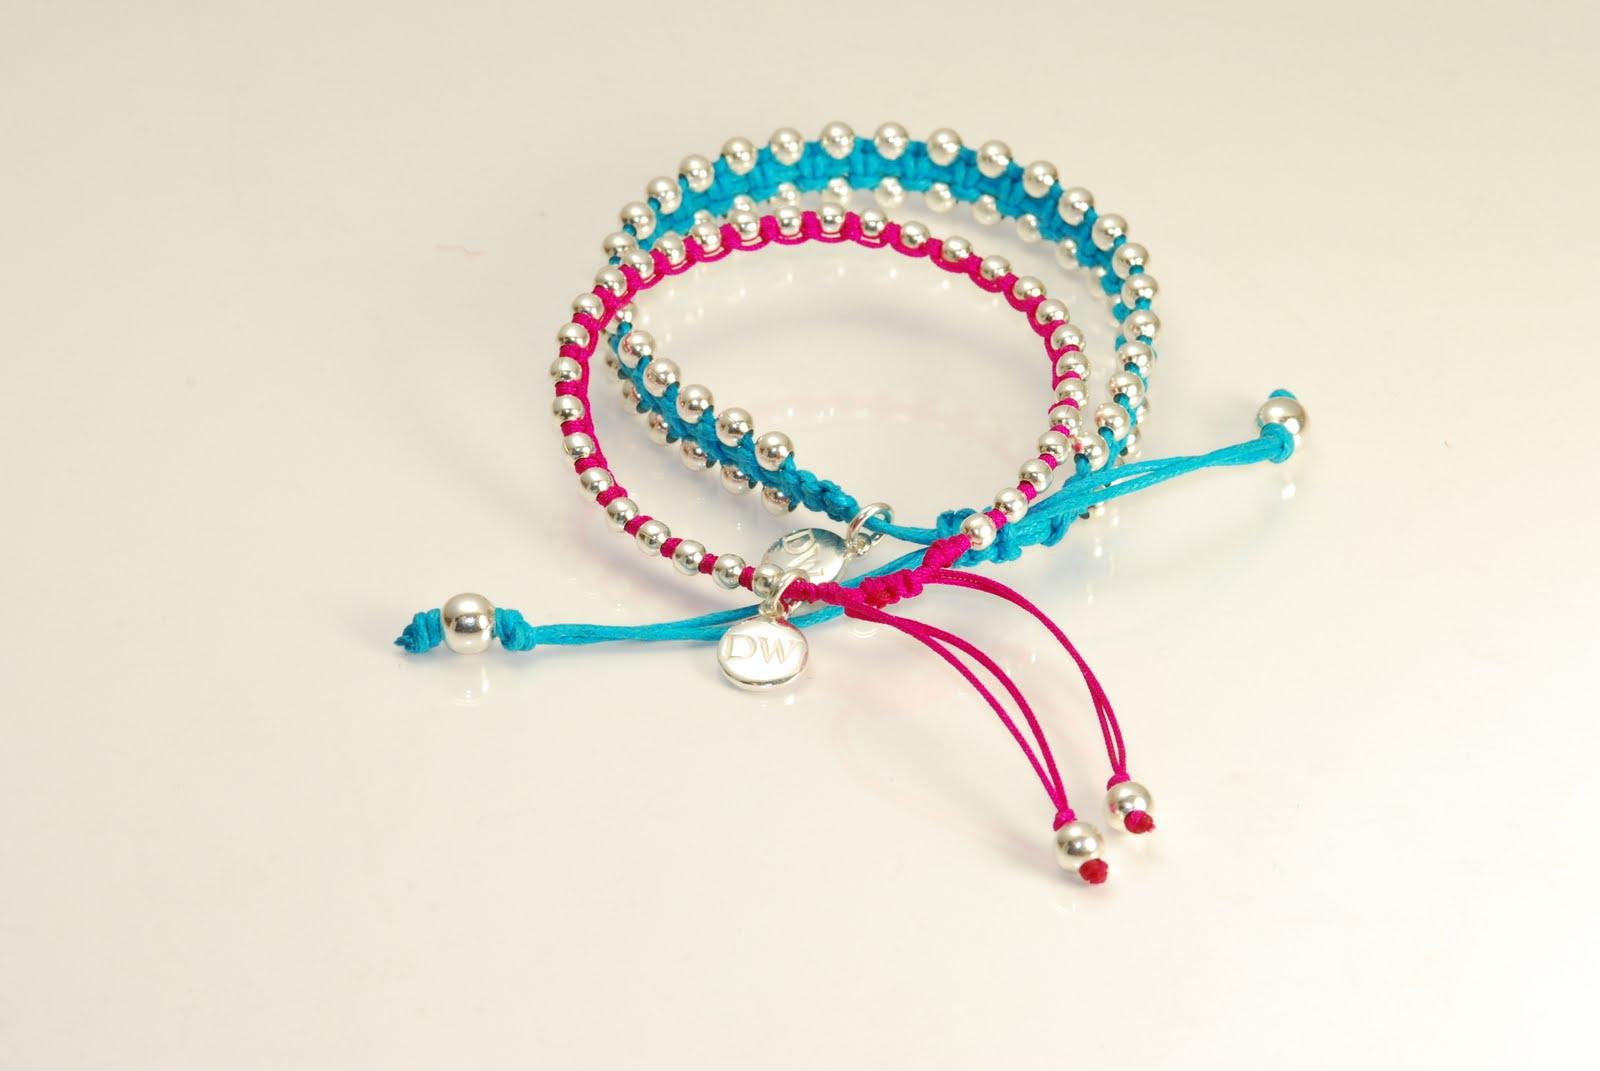 dominic walmsley jewellery new friendship bracelets